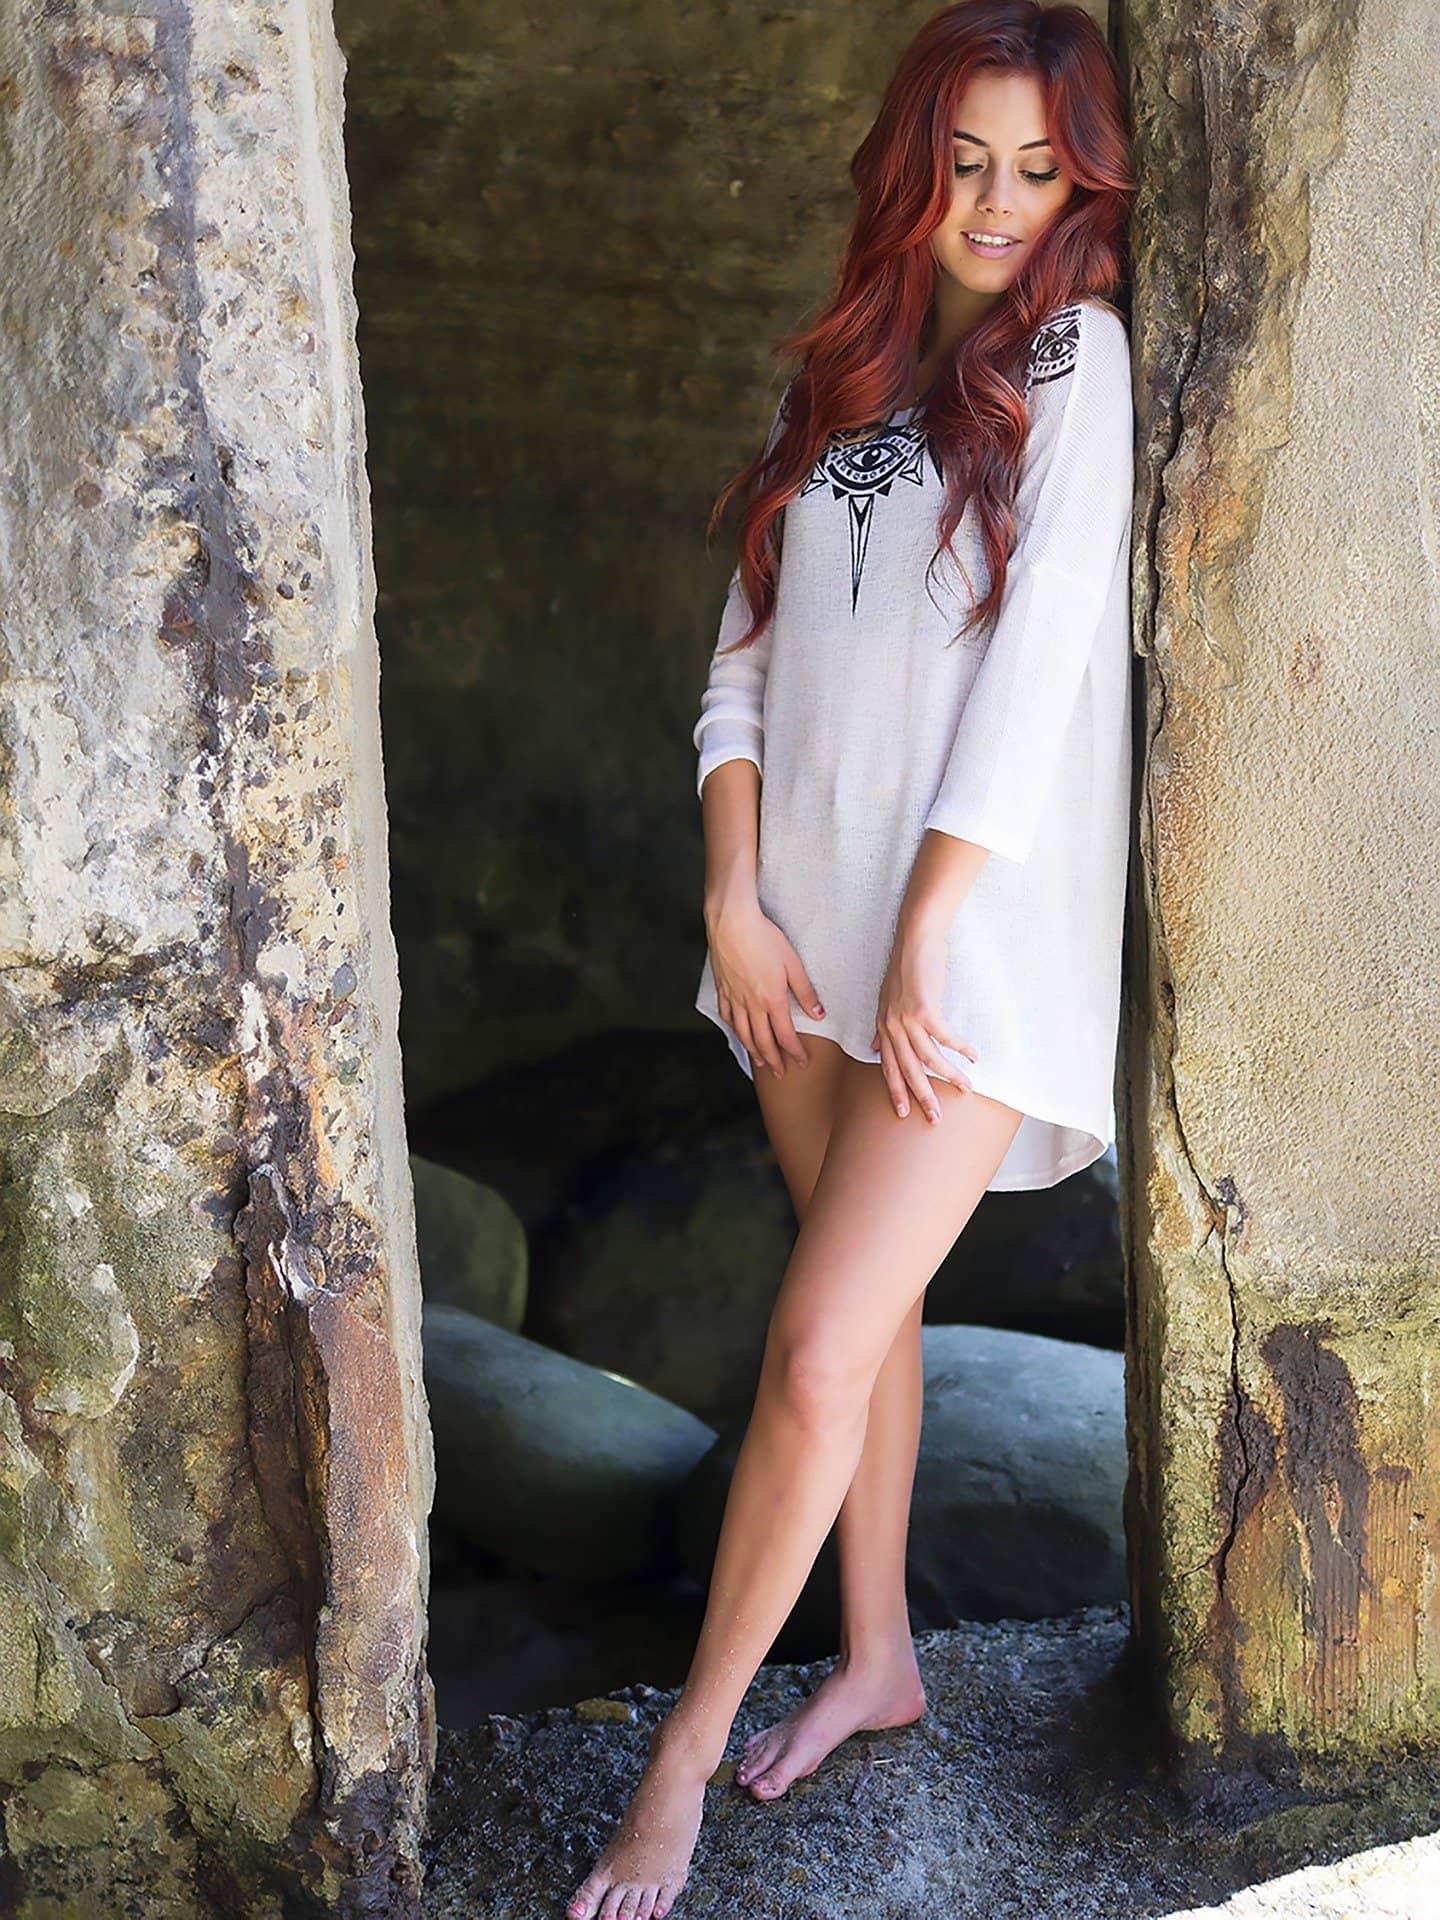 Redhead Lady long legs